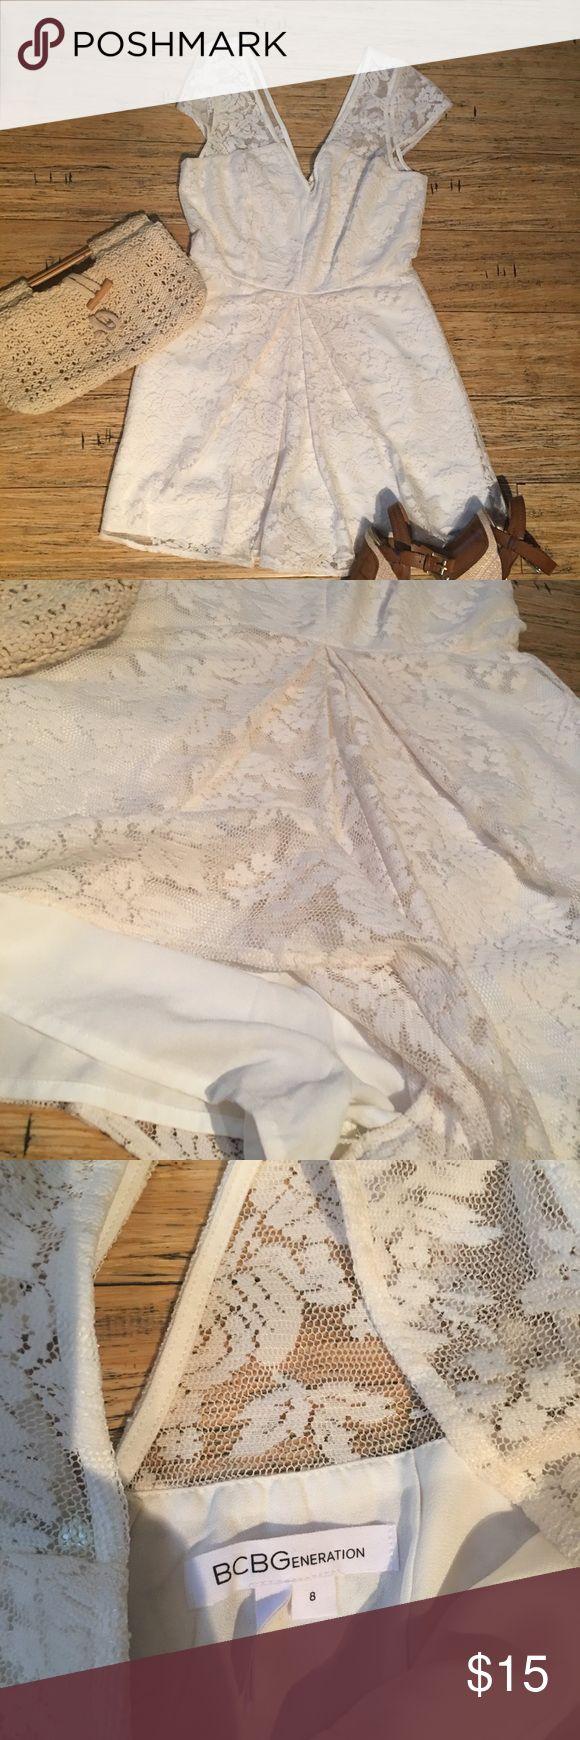 BCBG Cream lace romper Cream lace over light cream liner romper with rear zipper. BCBGeneration Shorts